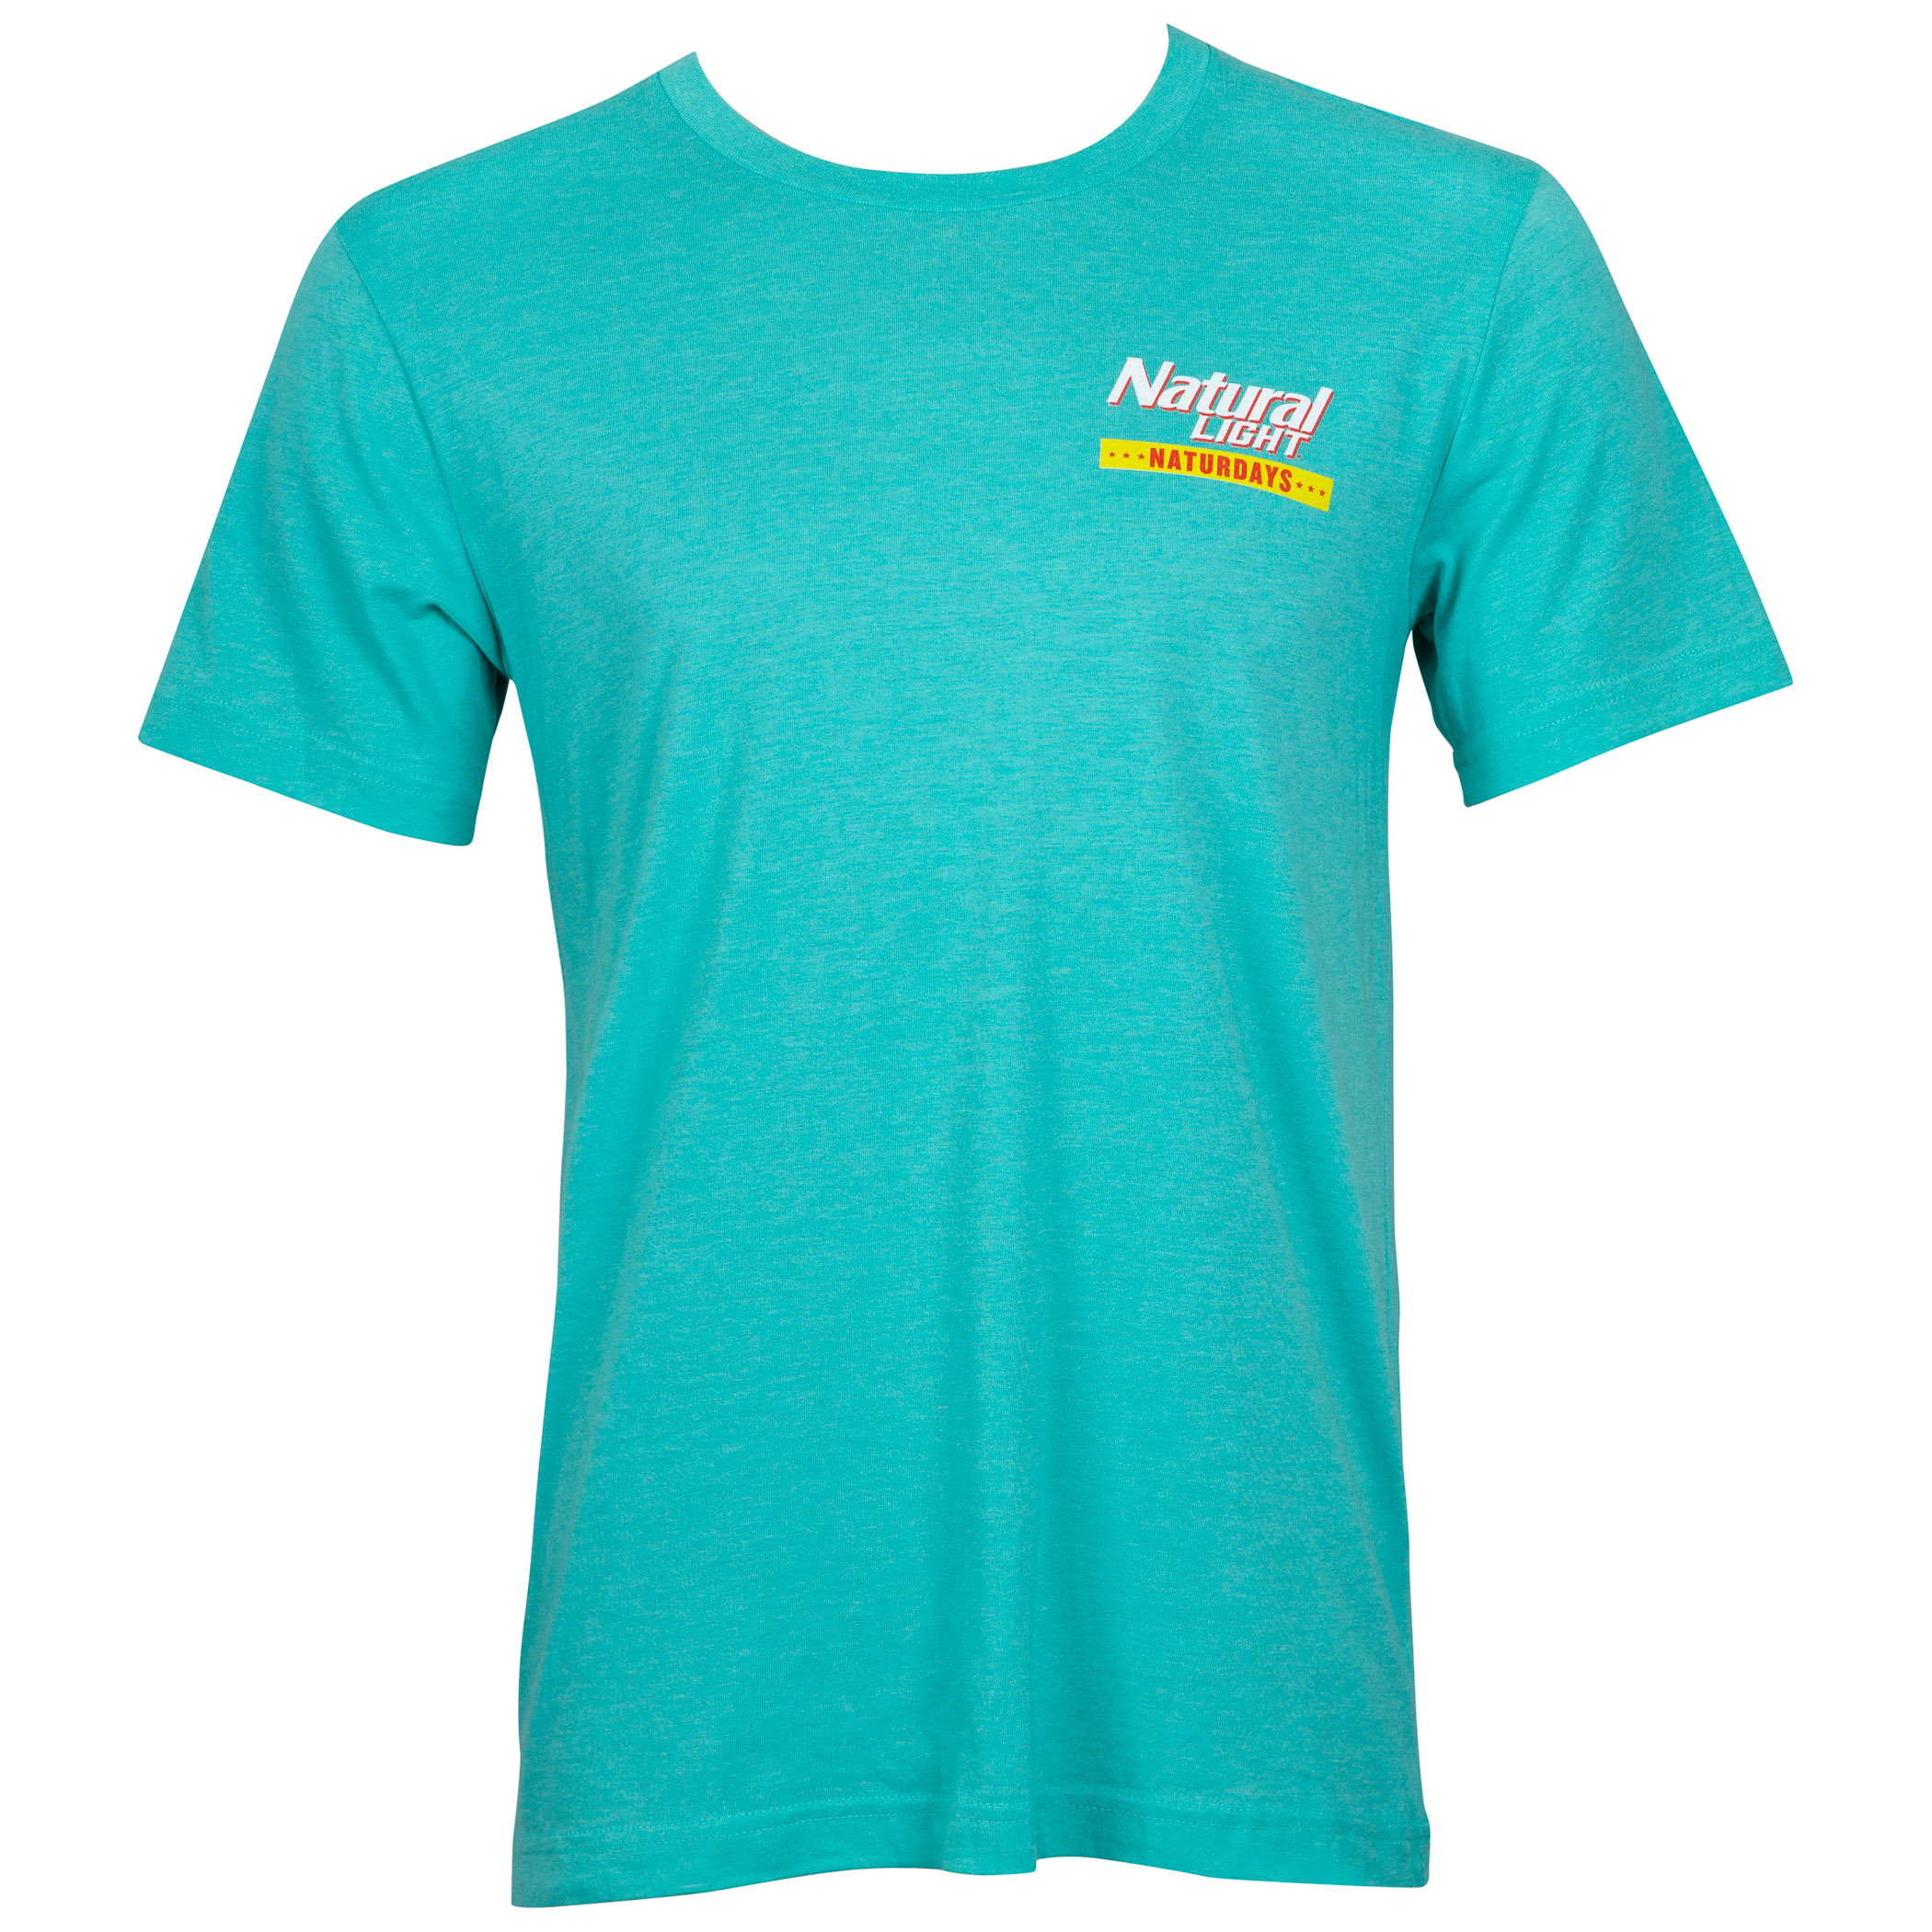 Natural Light Green Natty Naturdays Men's T-Shirt